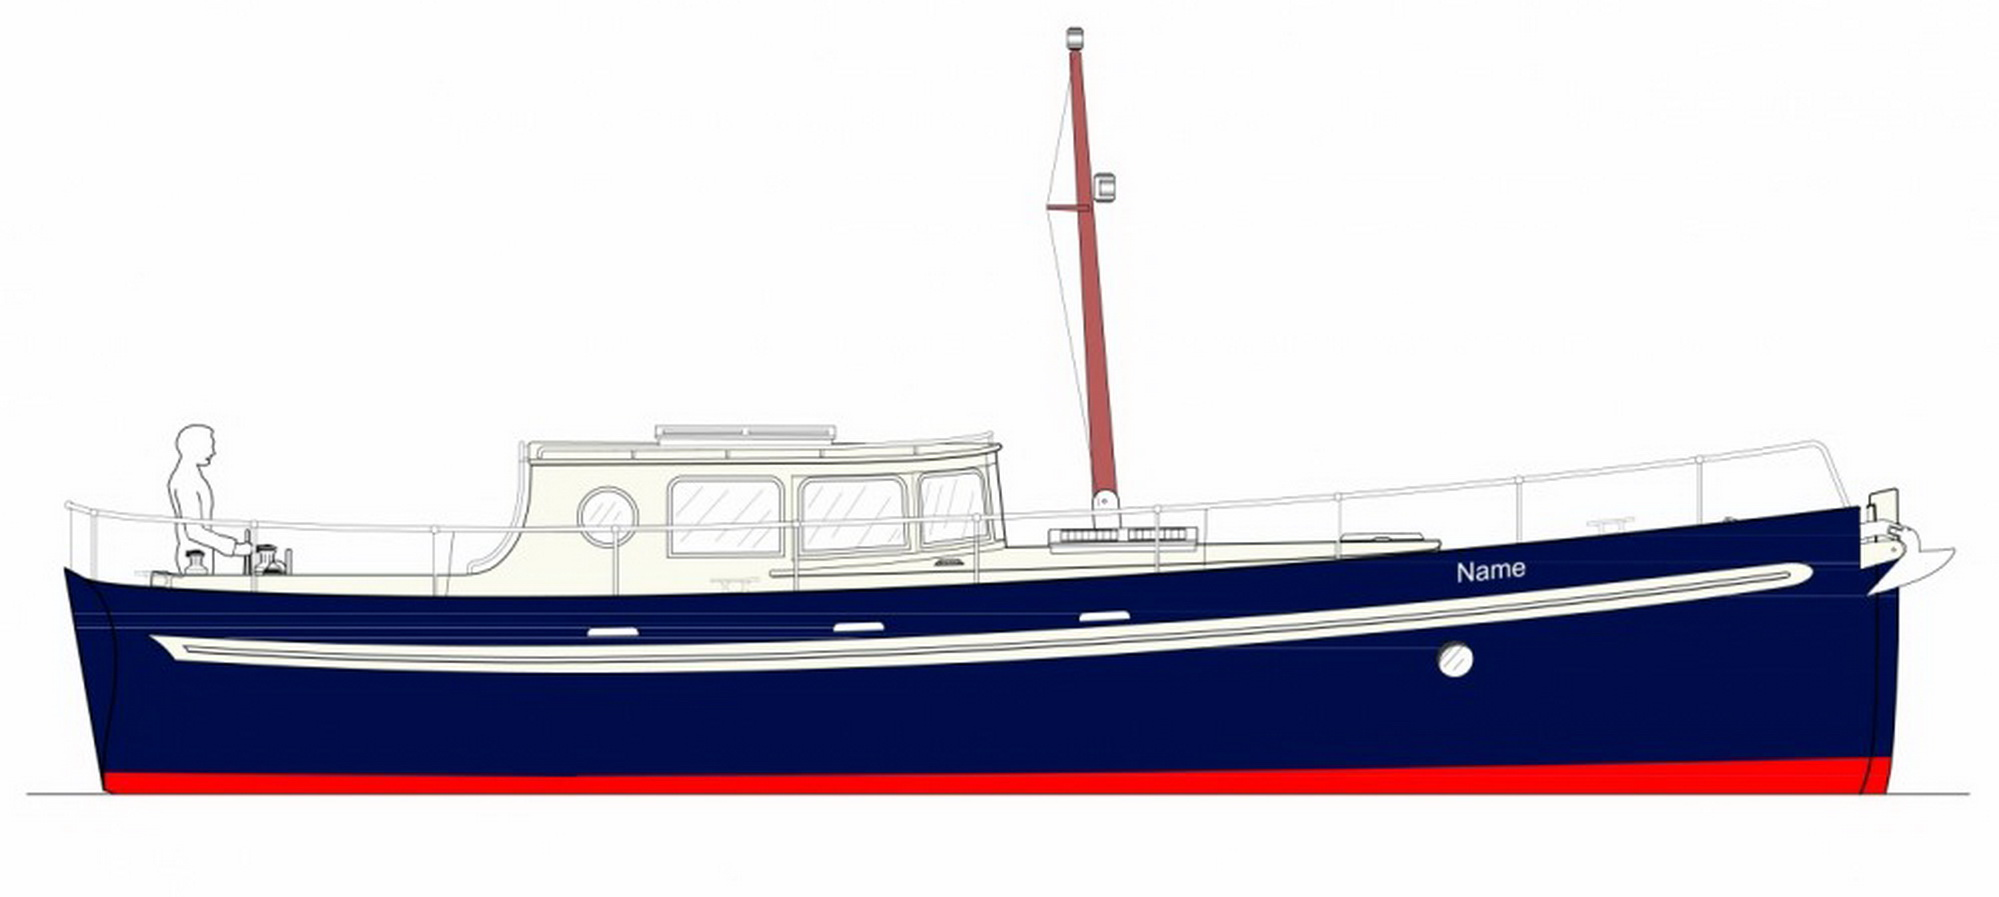 Goeree 1270 Motor Yacht Motor Sailer Olivier Van Meer Design